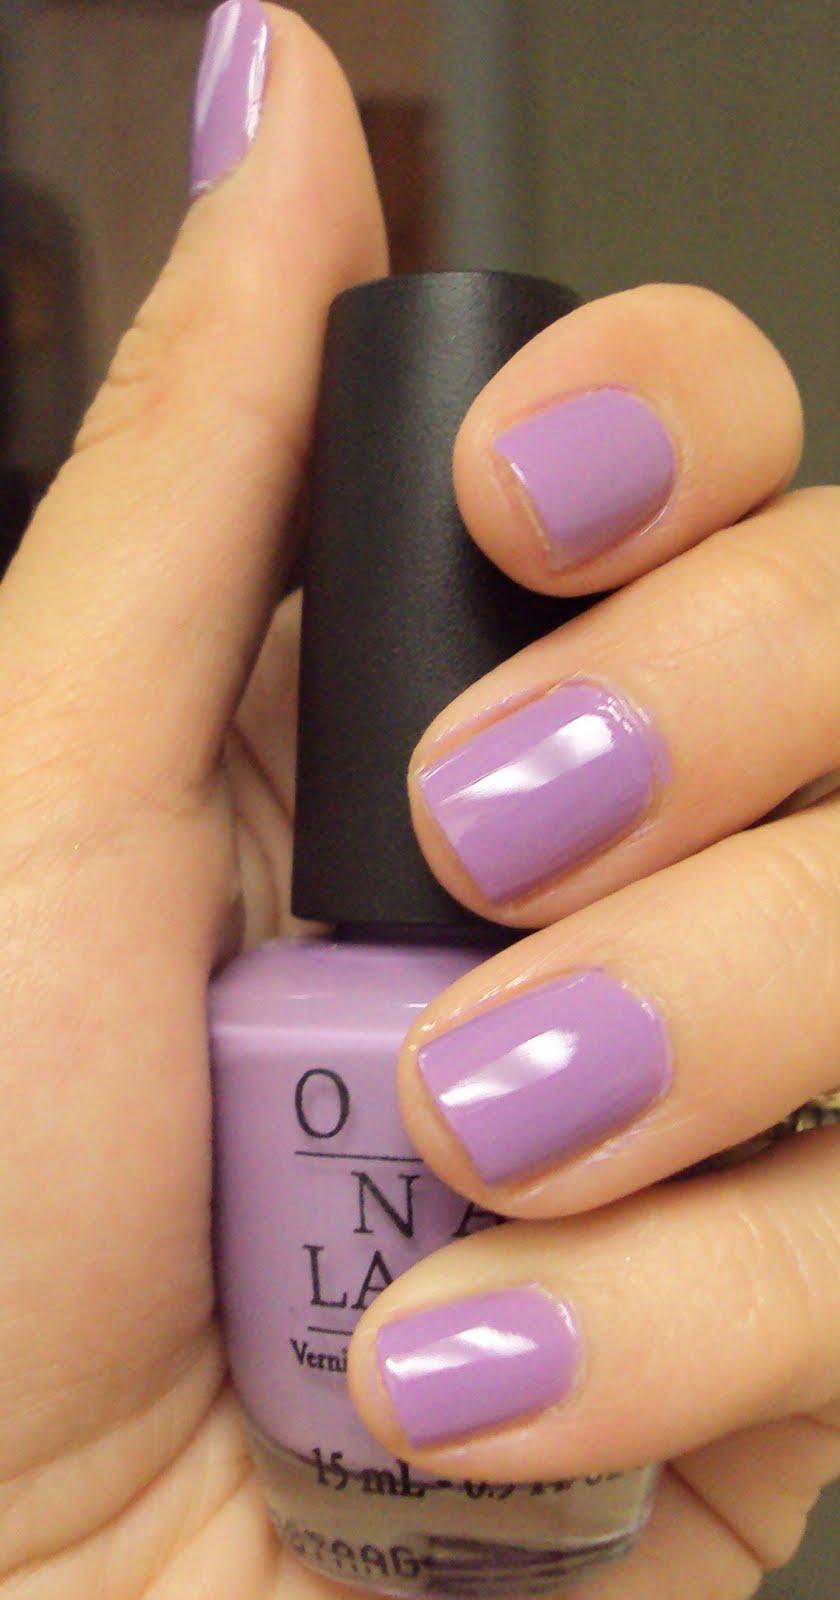 "Ansa's Beauty and fashion blog: NOTD OPI ""Do you lilac it?""  Ansa's Beau..."